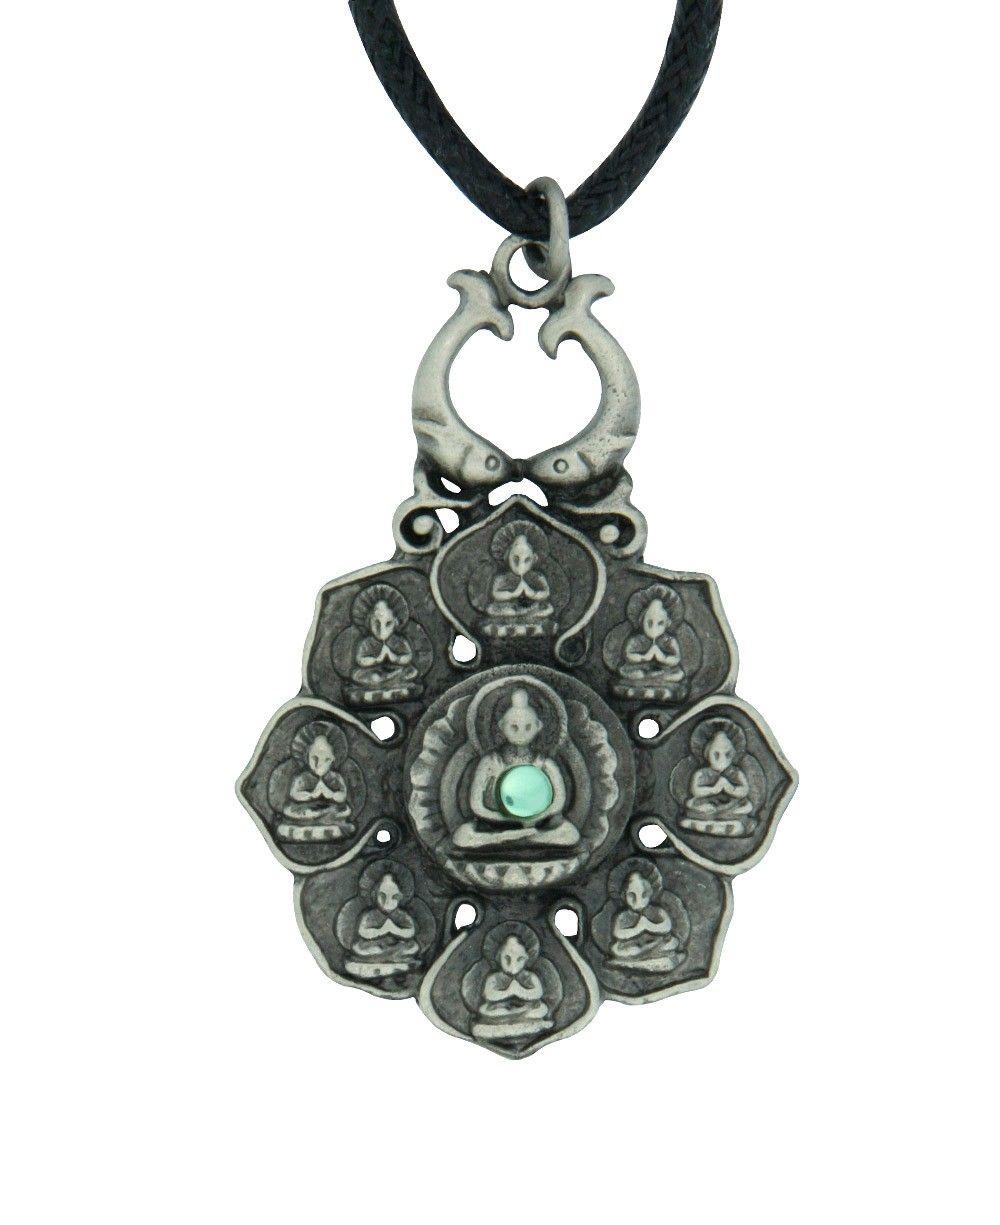 Large lotus pendant representing eightfold path of buddhism large lotus pendant representing eightfold path of buddhism pendants jewelry biocorpaavc Images